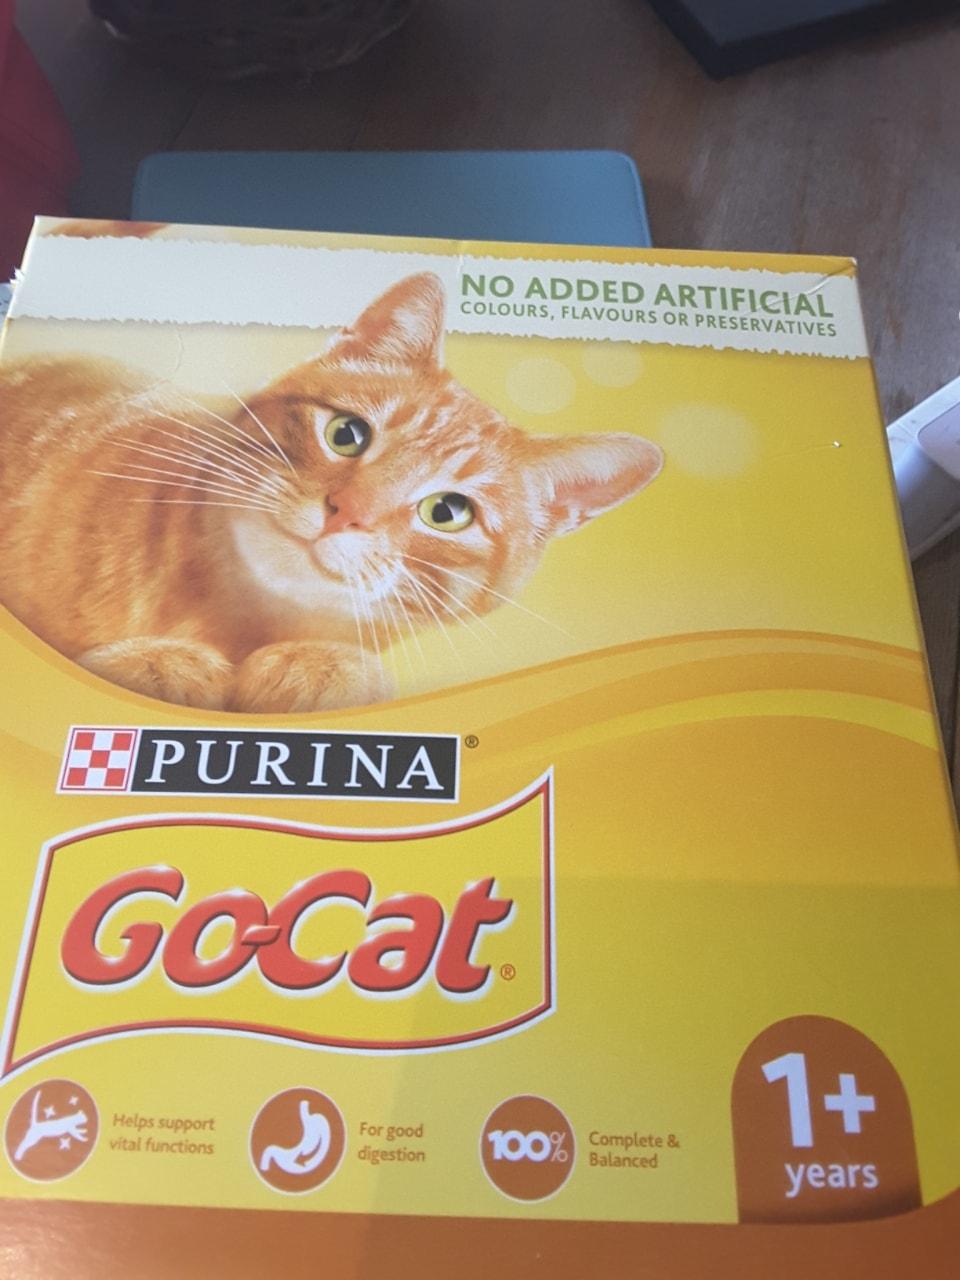 Opened box of Go Cat